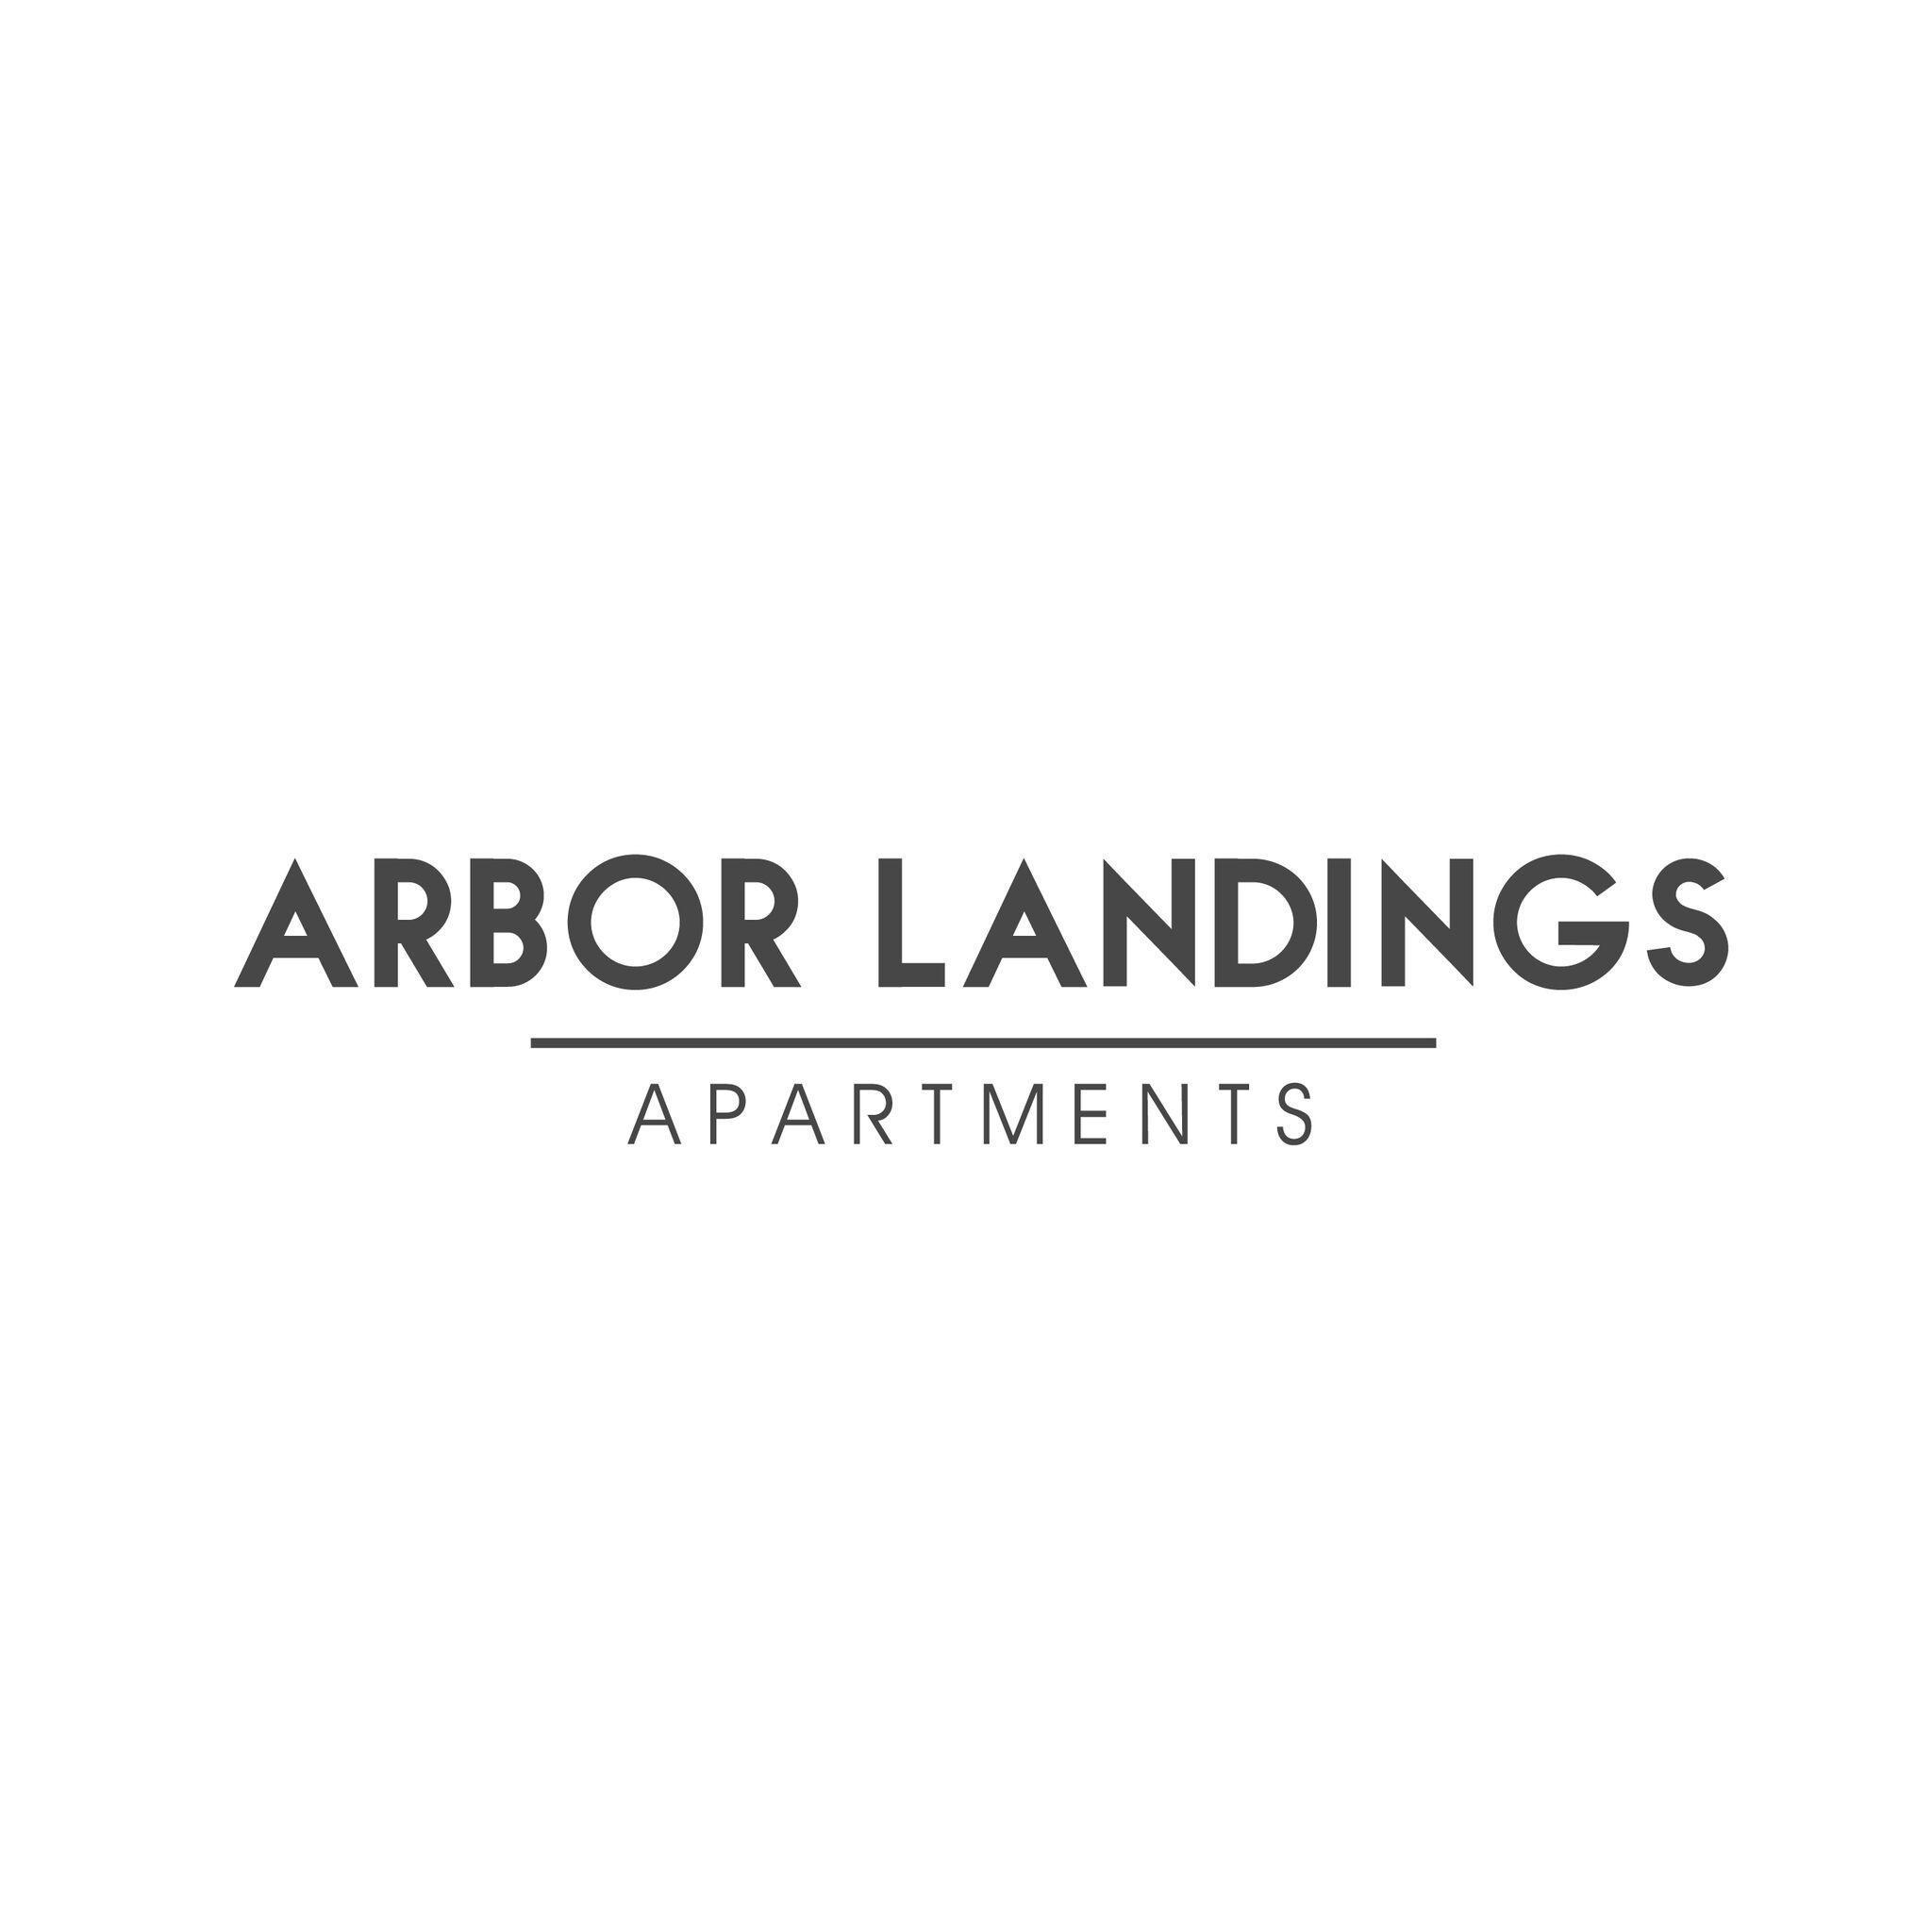 Arbor Landings Apartments